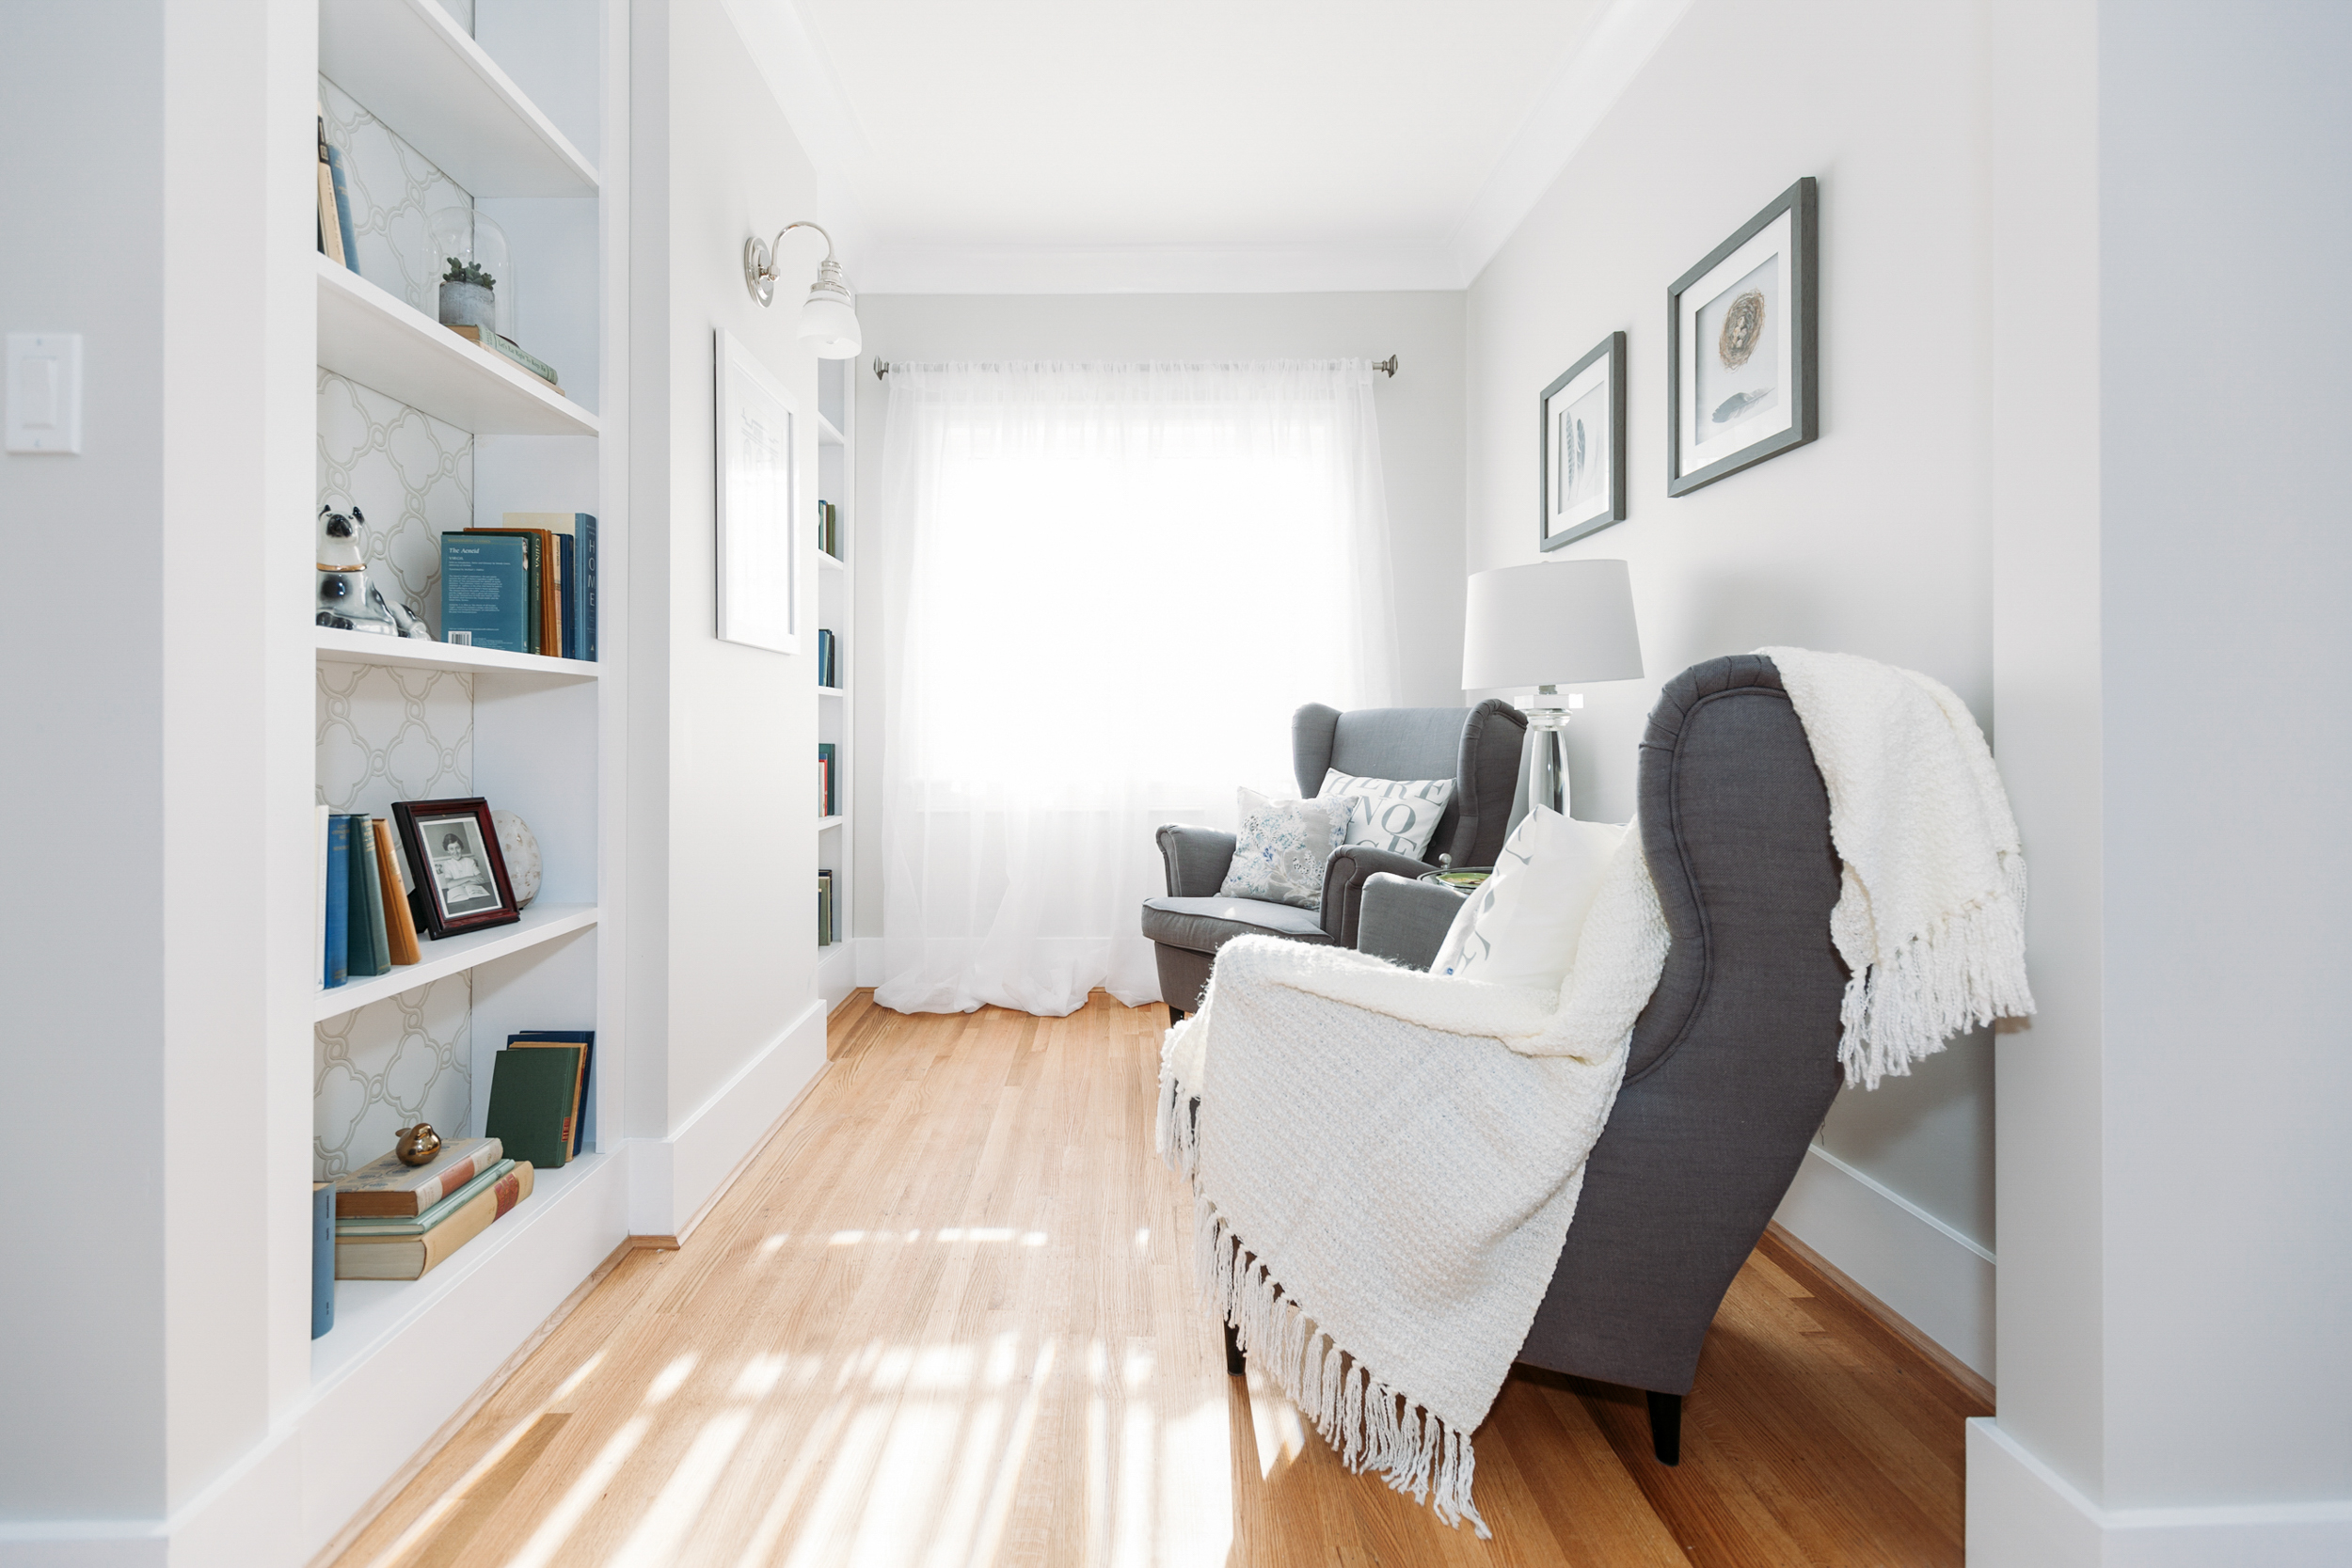 vancouver-interior-design-0018.jpg